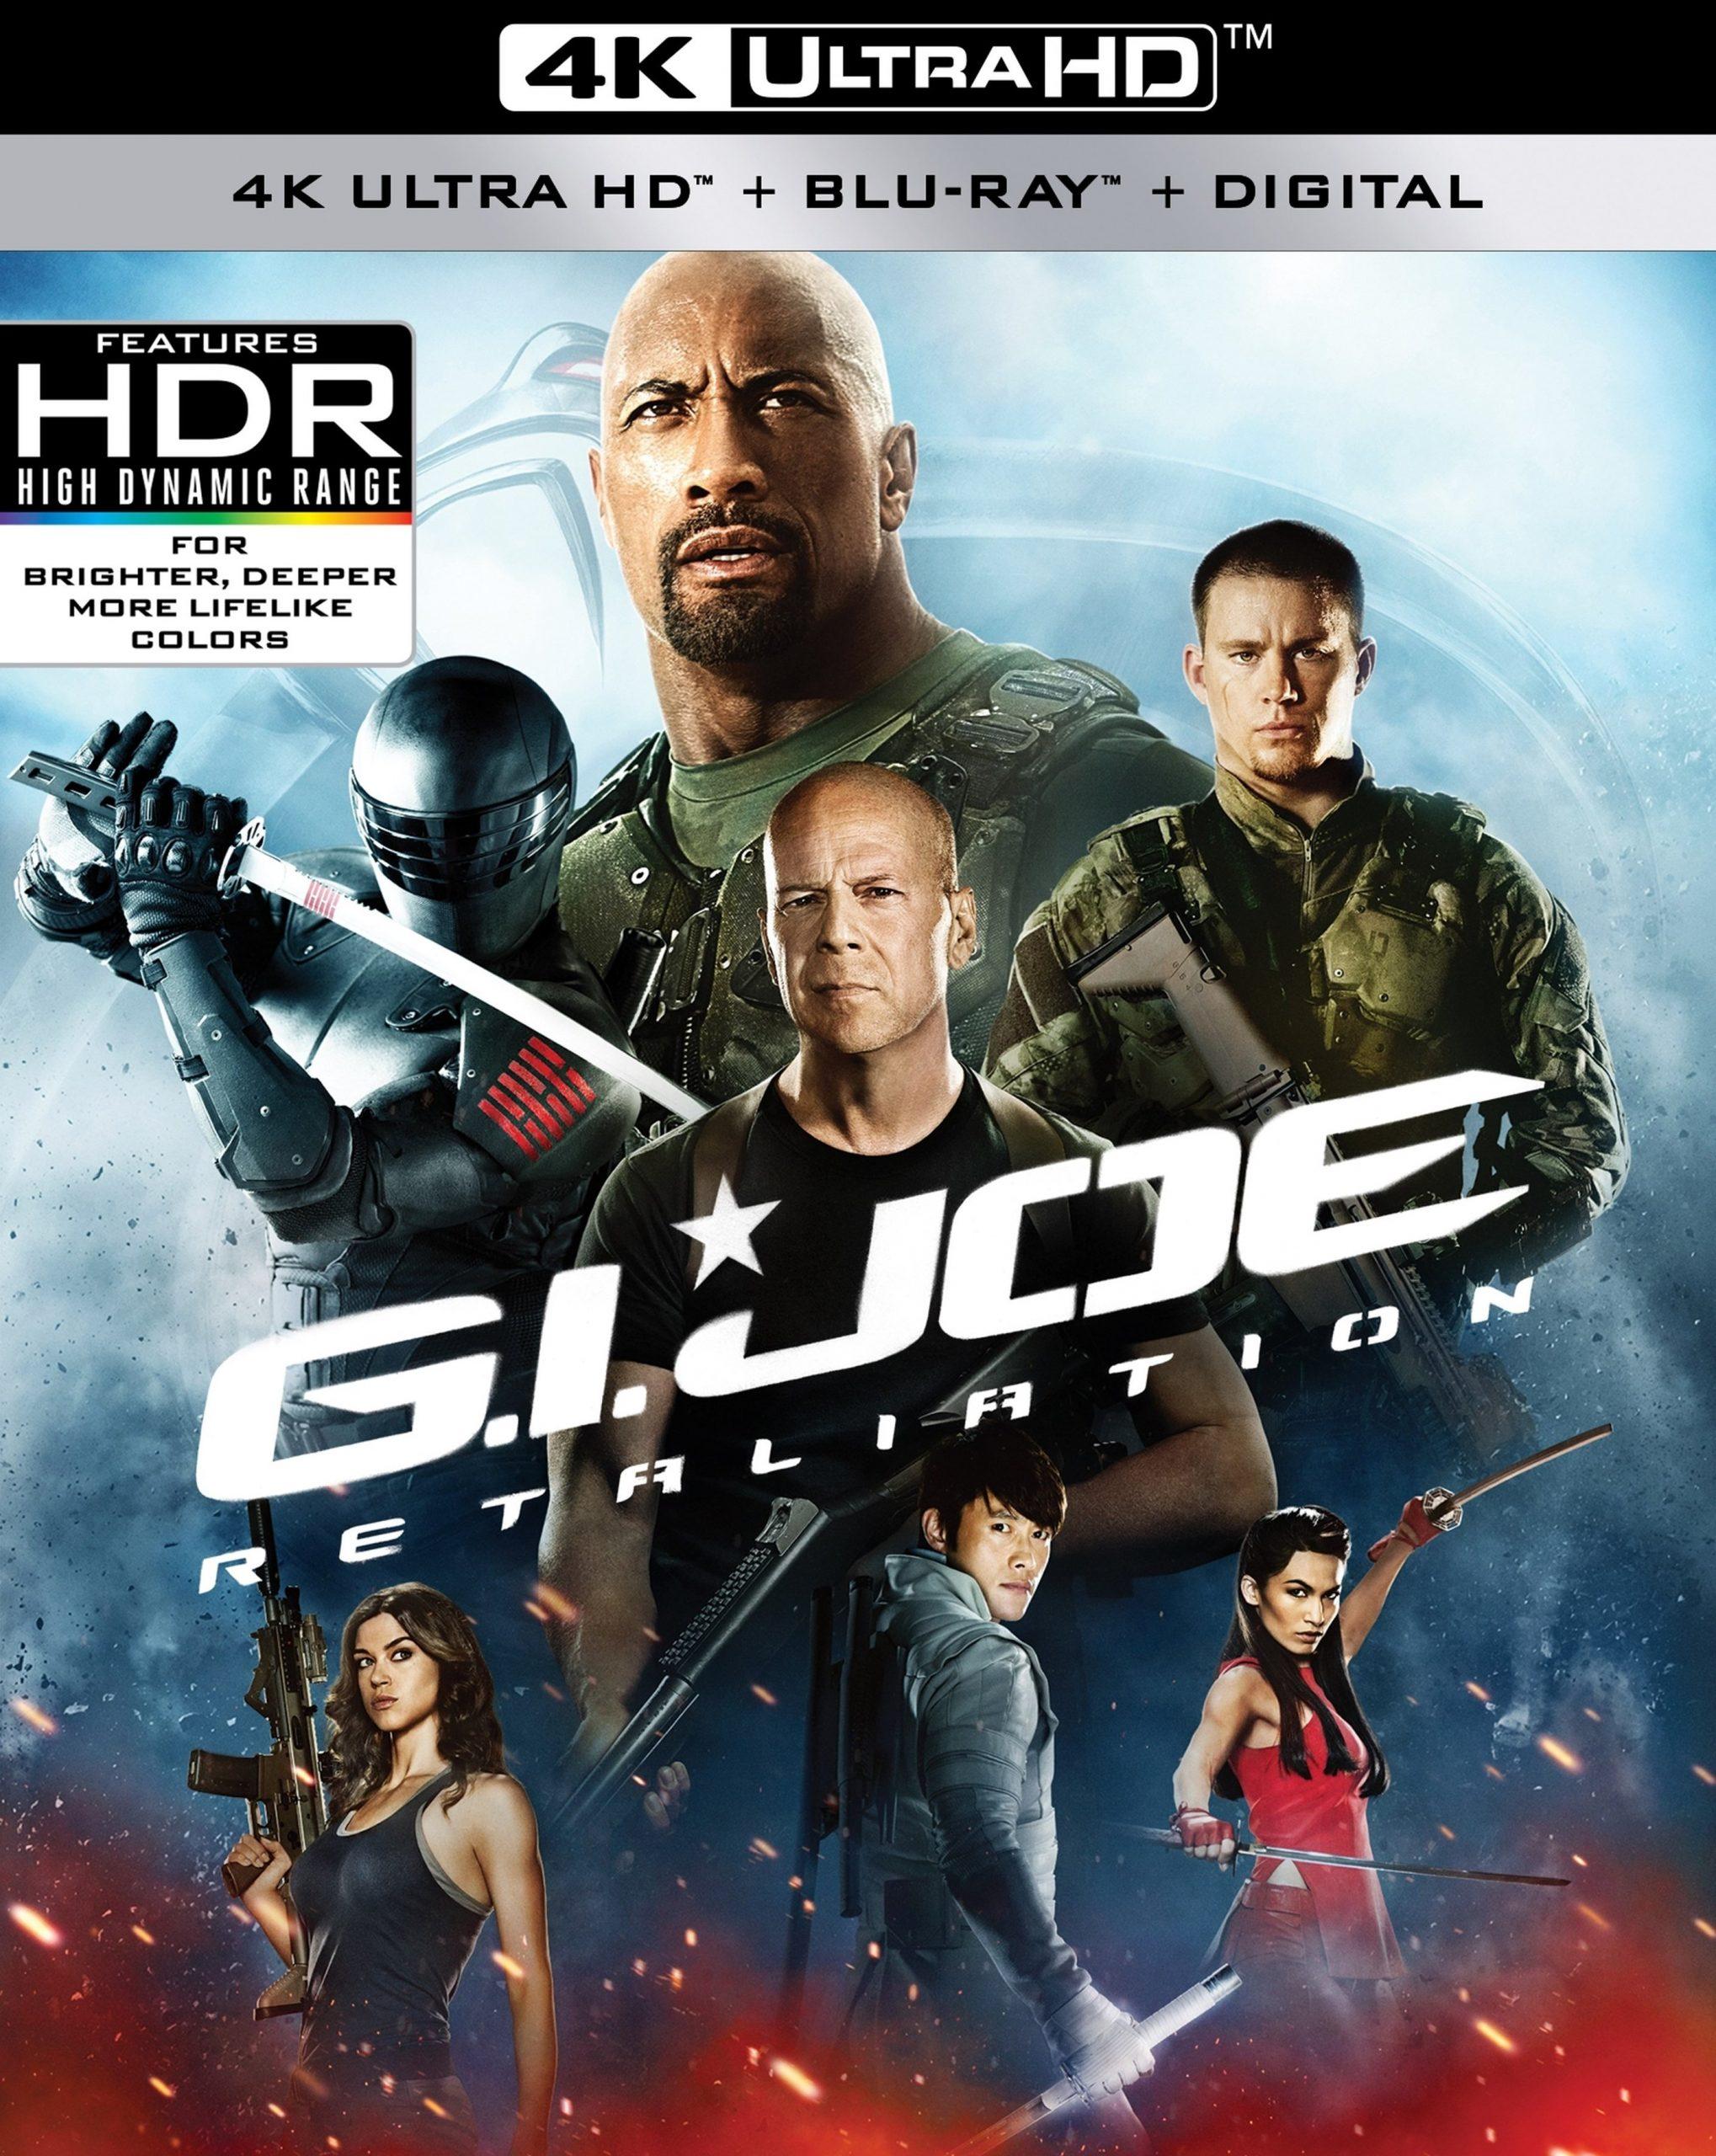 G.I. Joe: Retaliation 4k